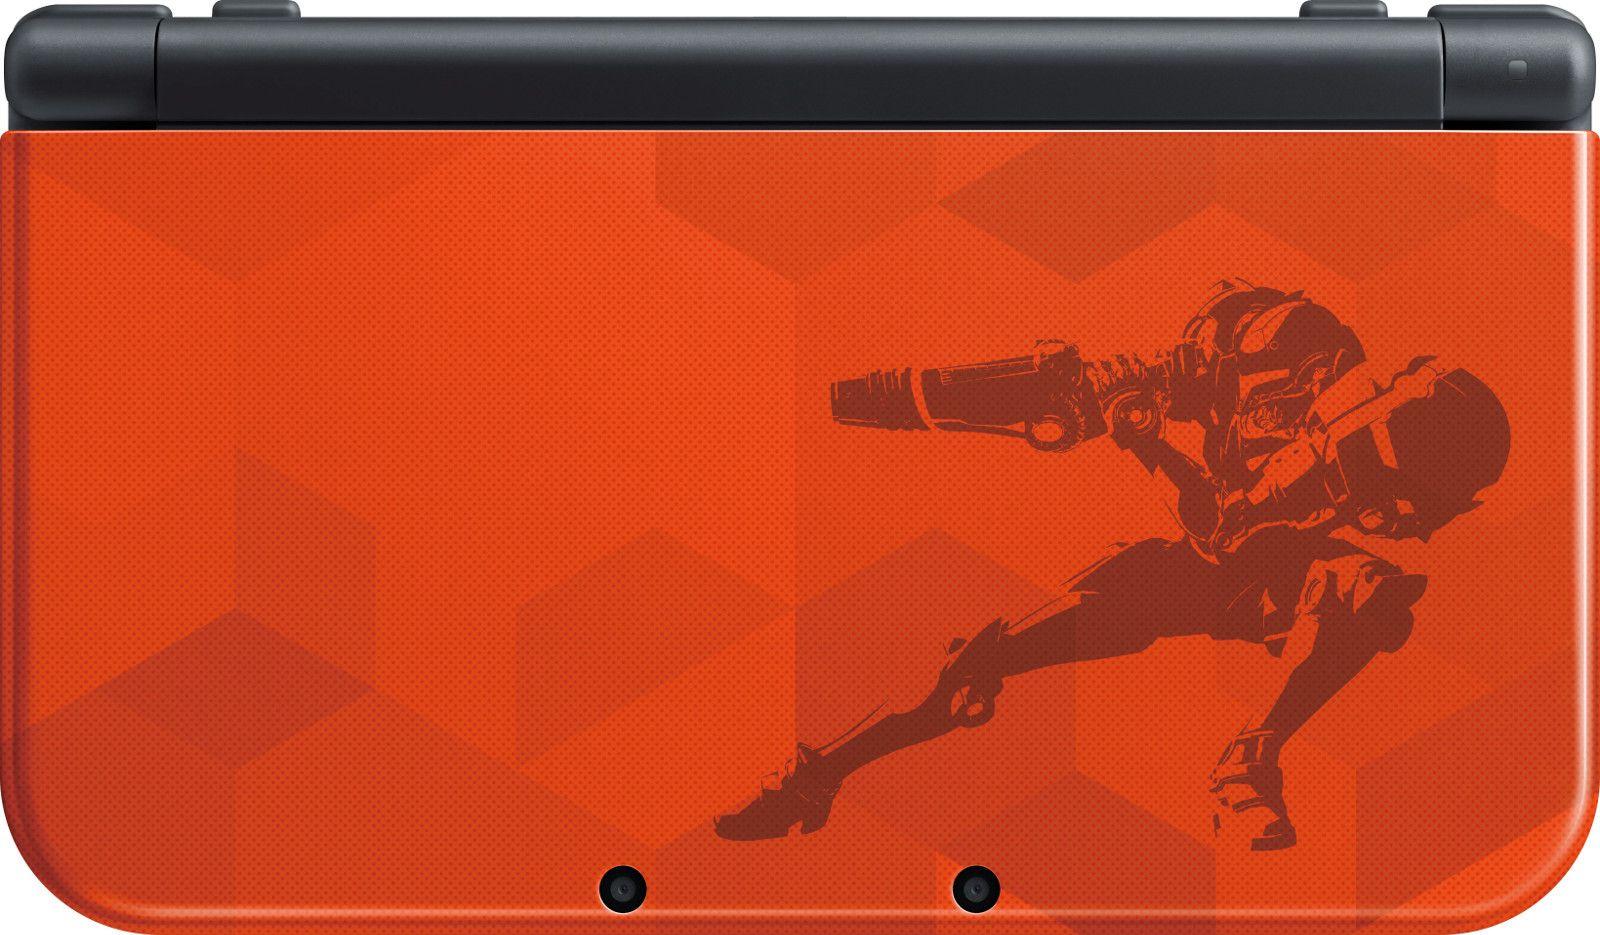 New Nintendo 3DS XL Samus Returns Limited Edition - 5